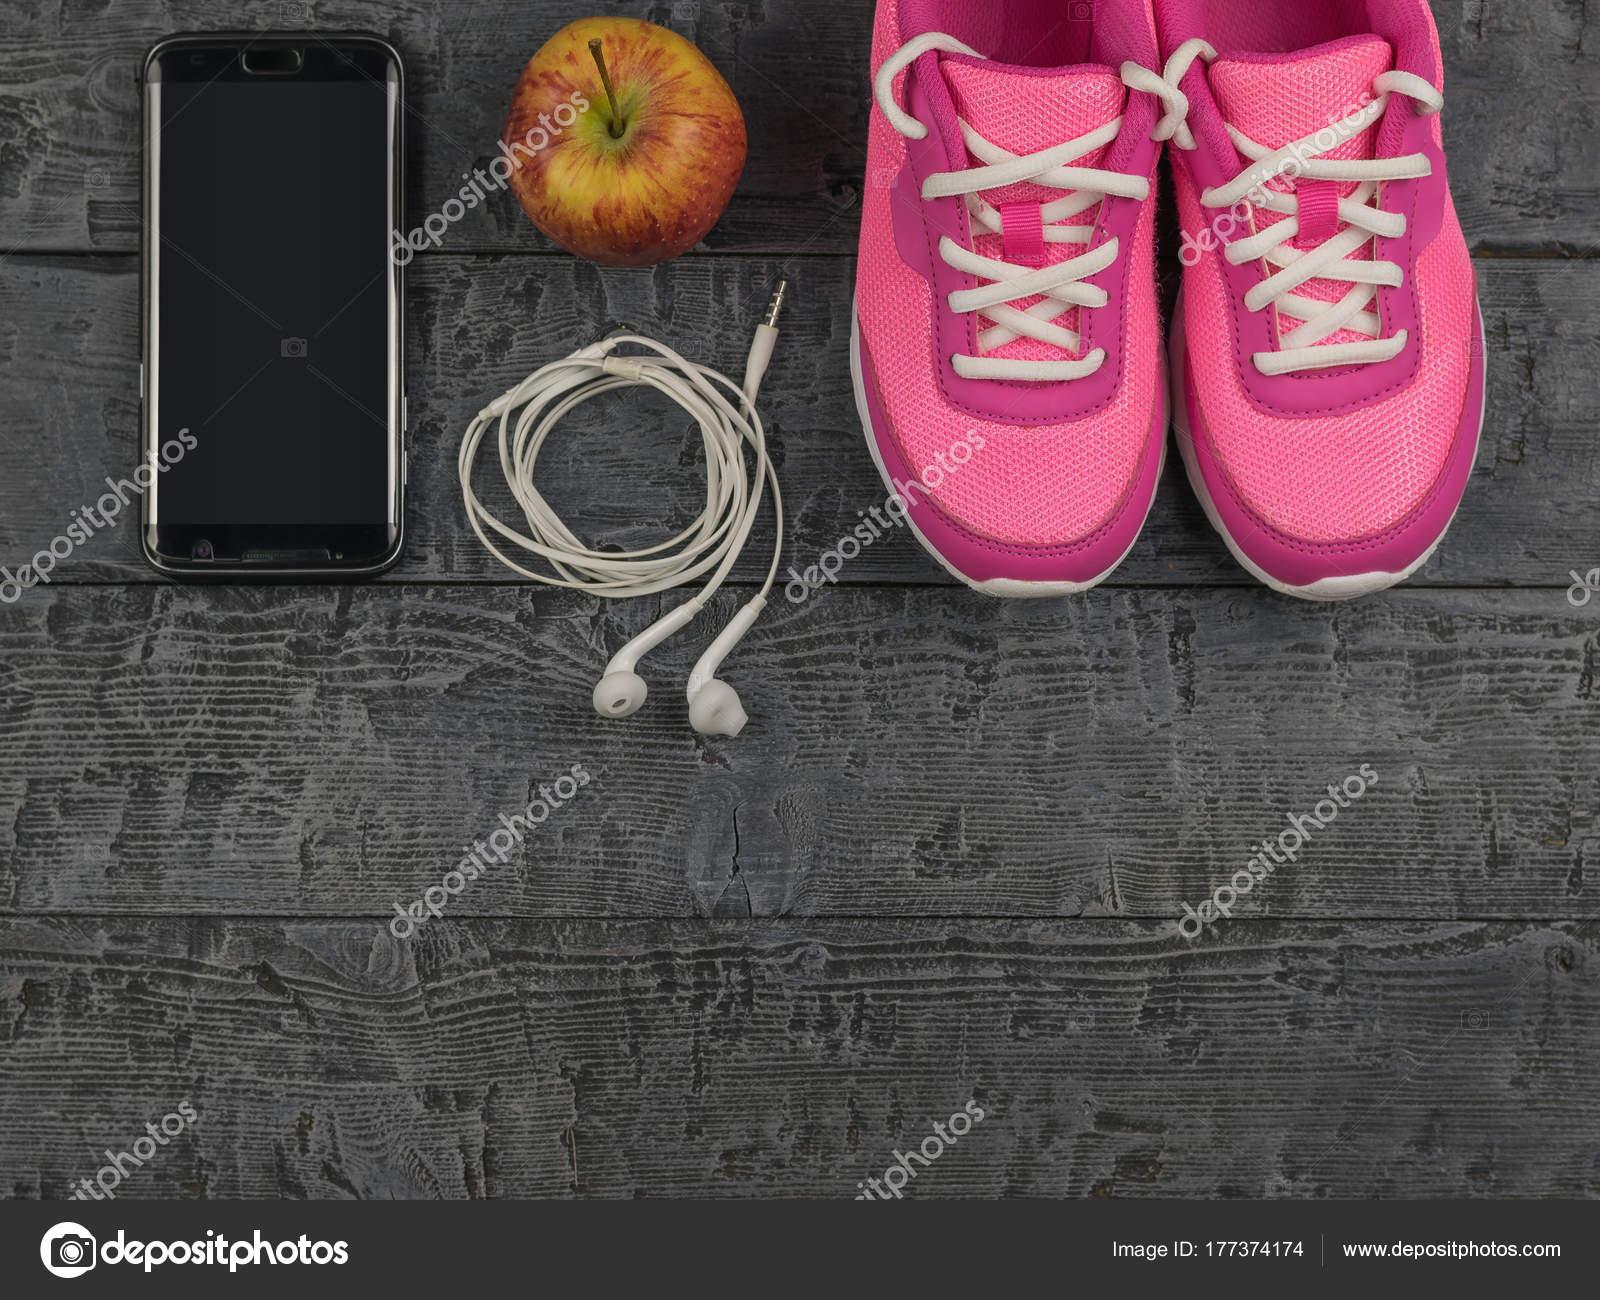 Sport Konzept. Fitness Geräte. Turnschuhe, Wasser, Apfel